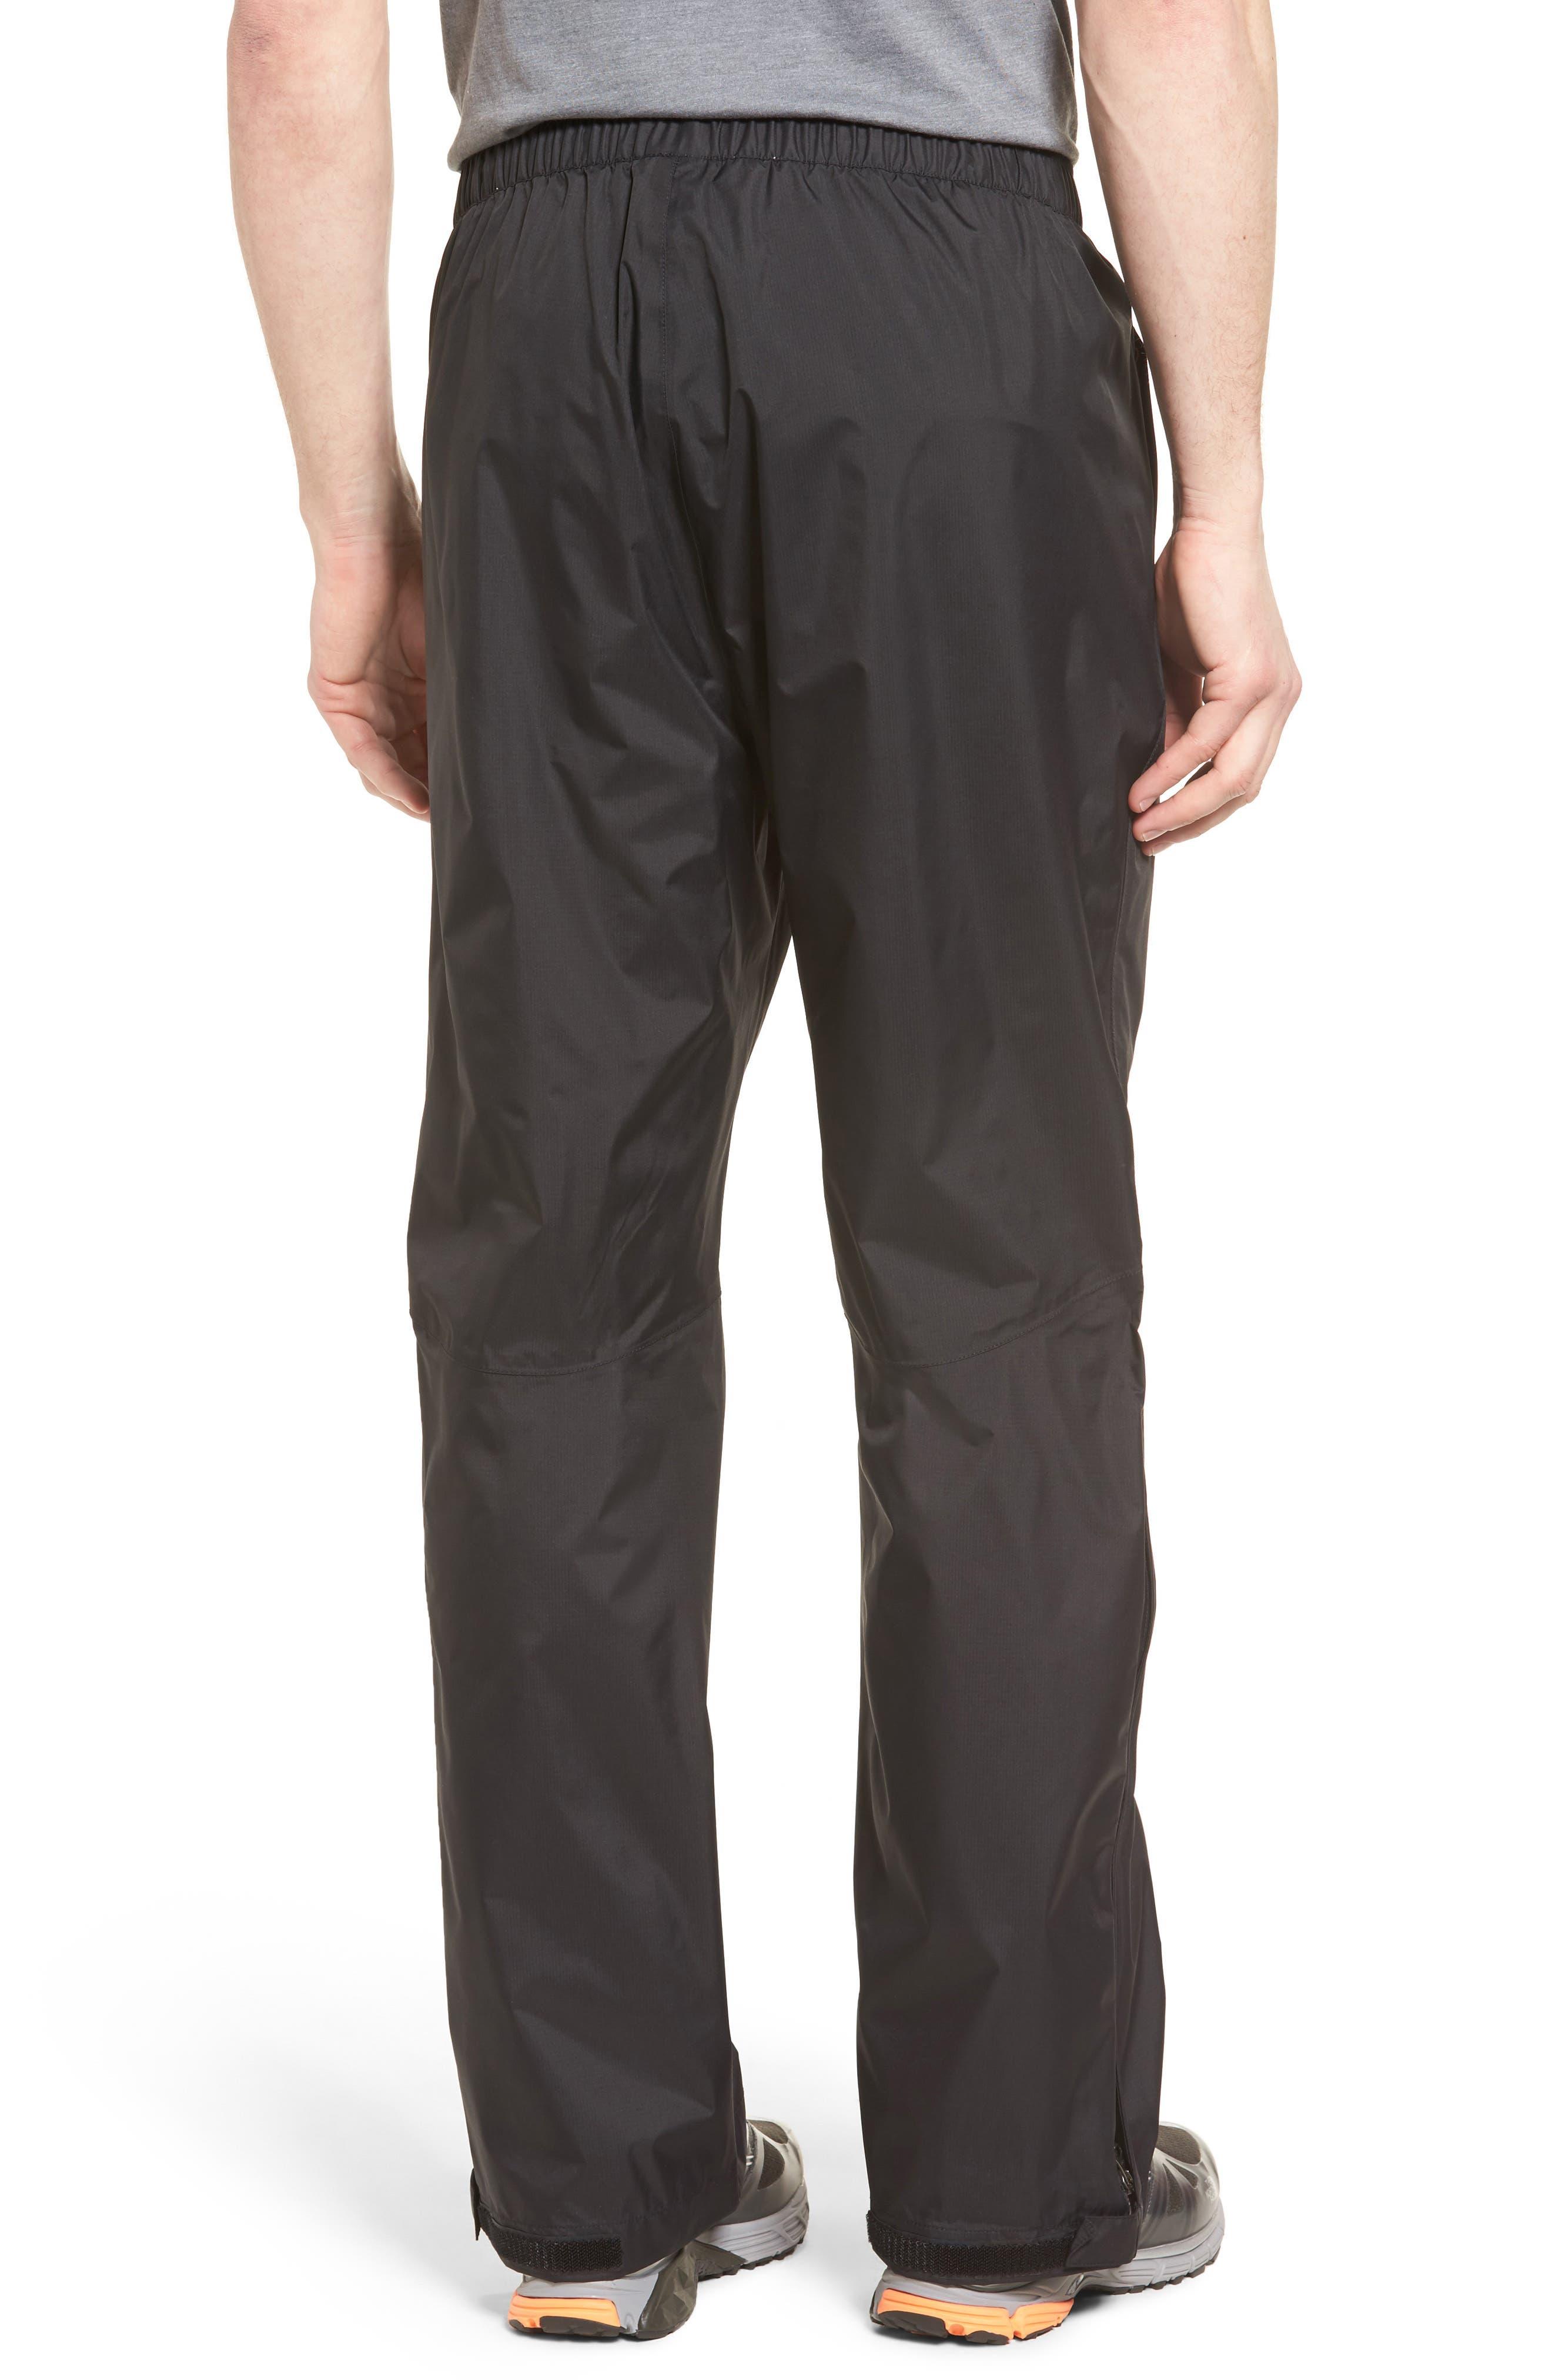 Venture Waterproof Pants,                             Alternate thumbnail 2, color,                             001